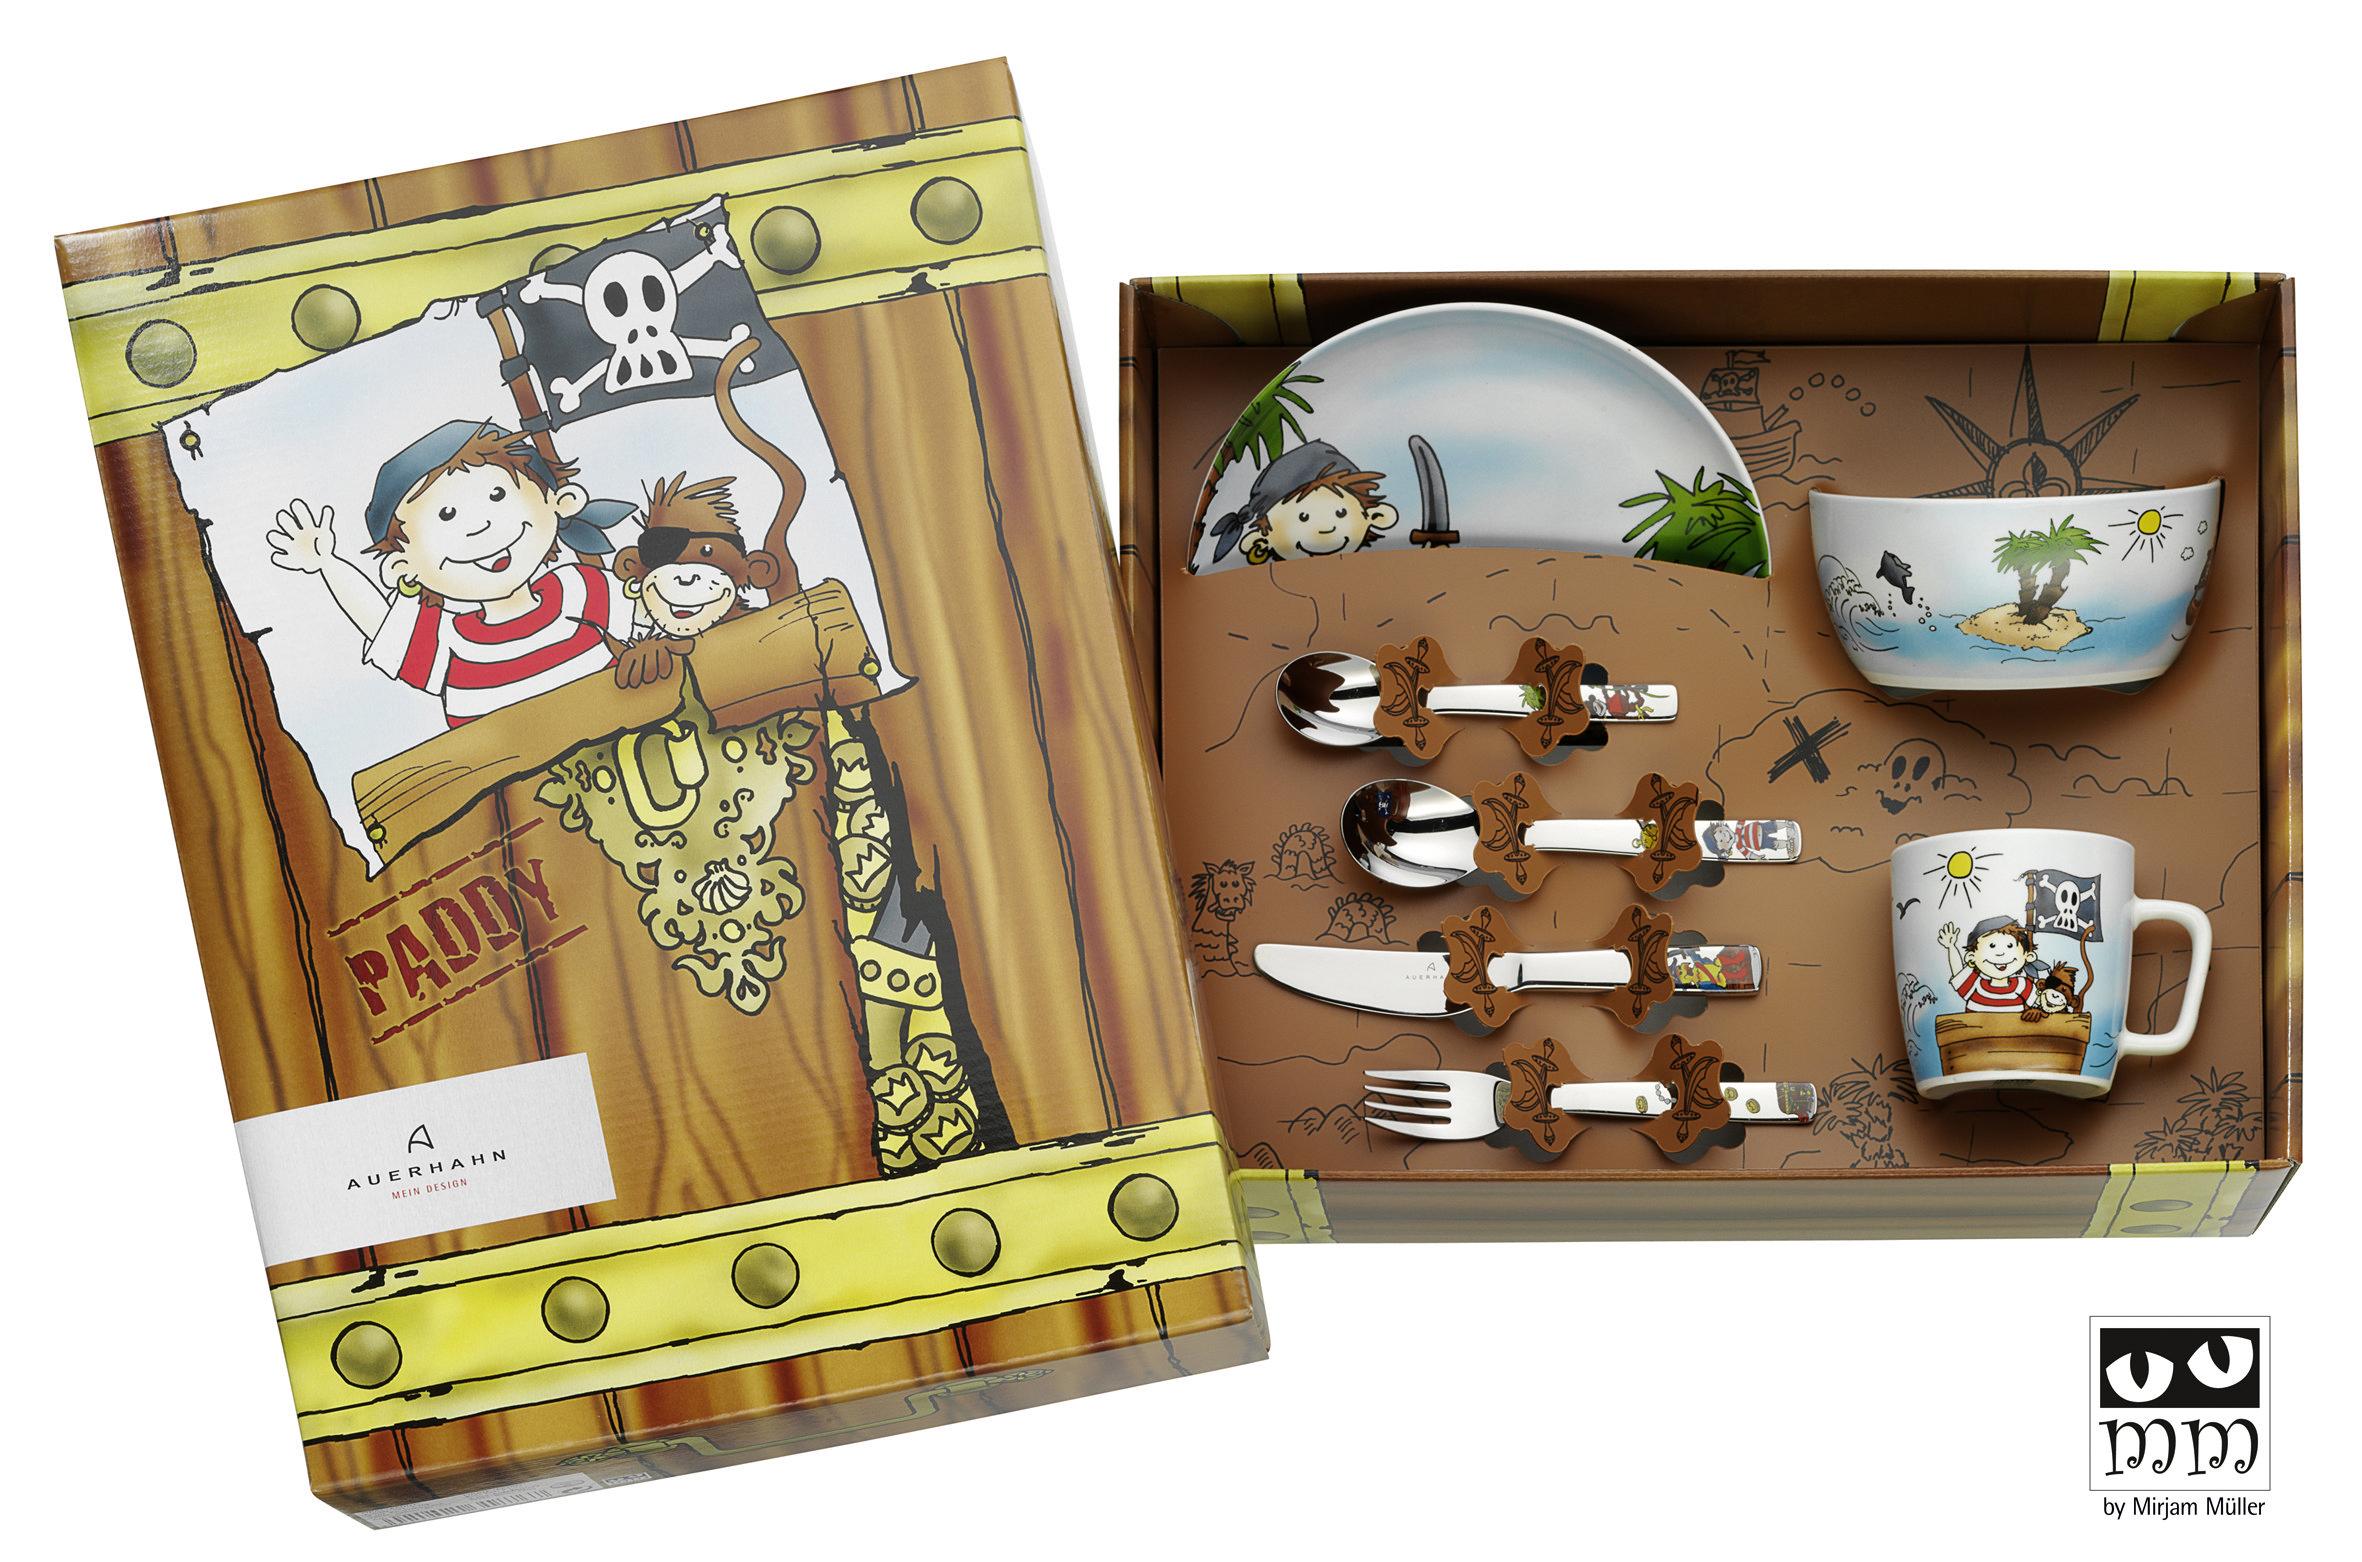 auerhahn 22 6061 0138 pirat paddy kinder set 7 teilig. Black Bedroom Furniture Sets. Home Design Ideas